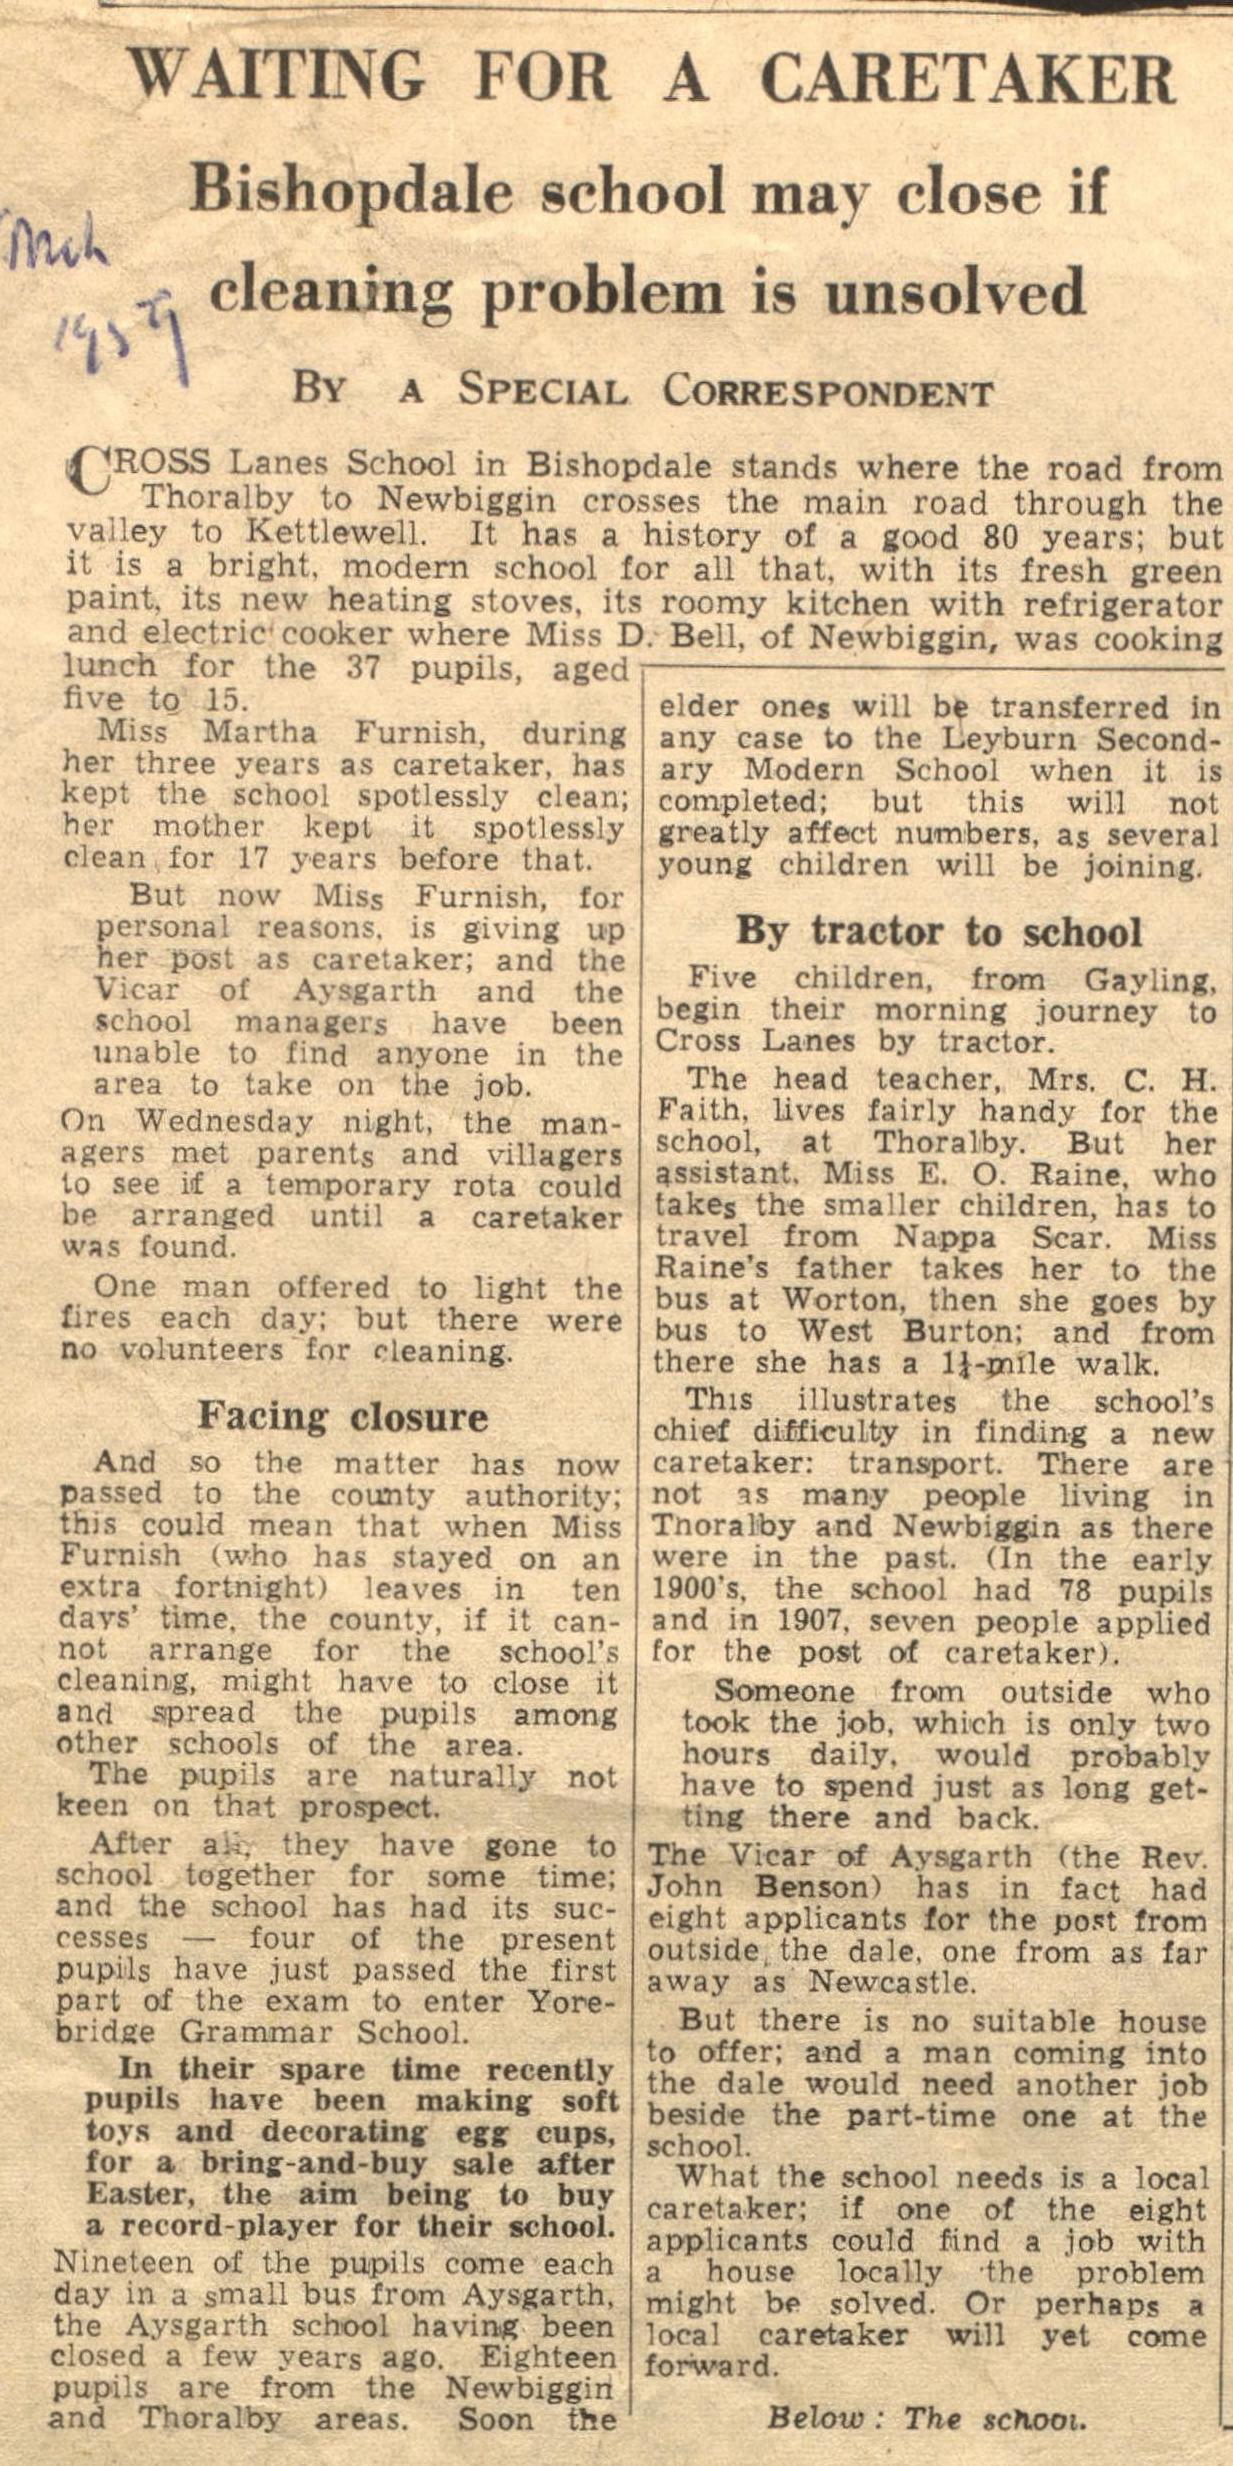 Cross Lanes School Caretaker problem, 1959